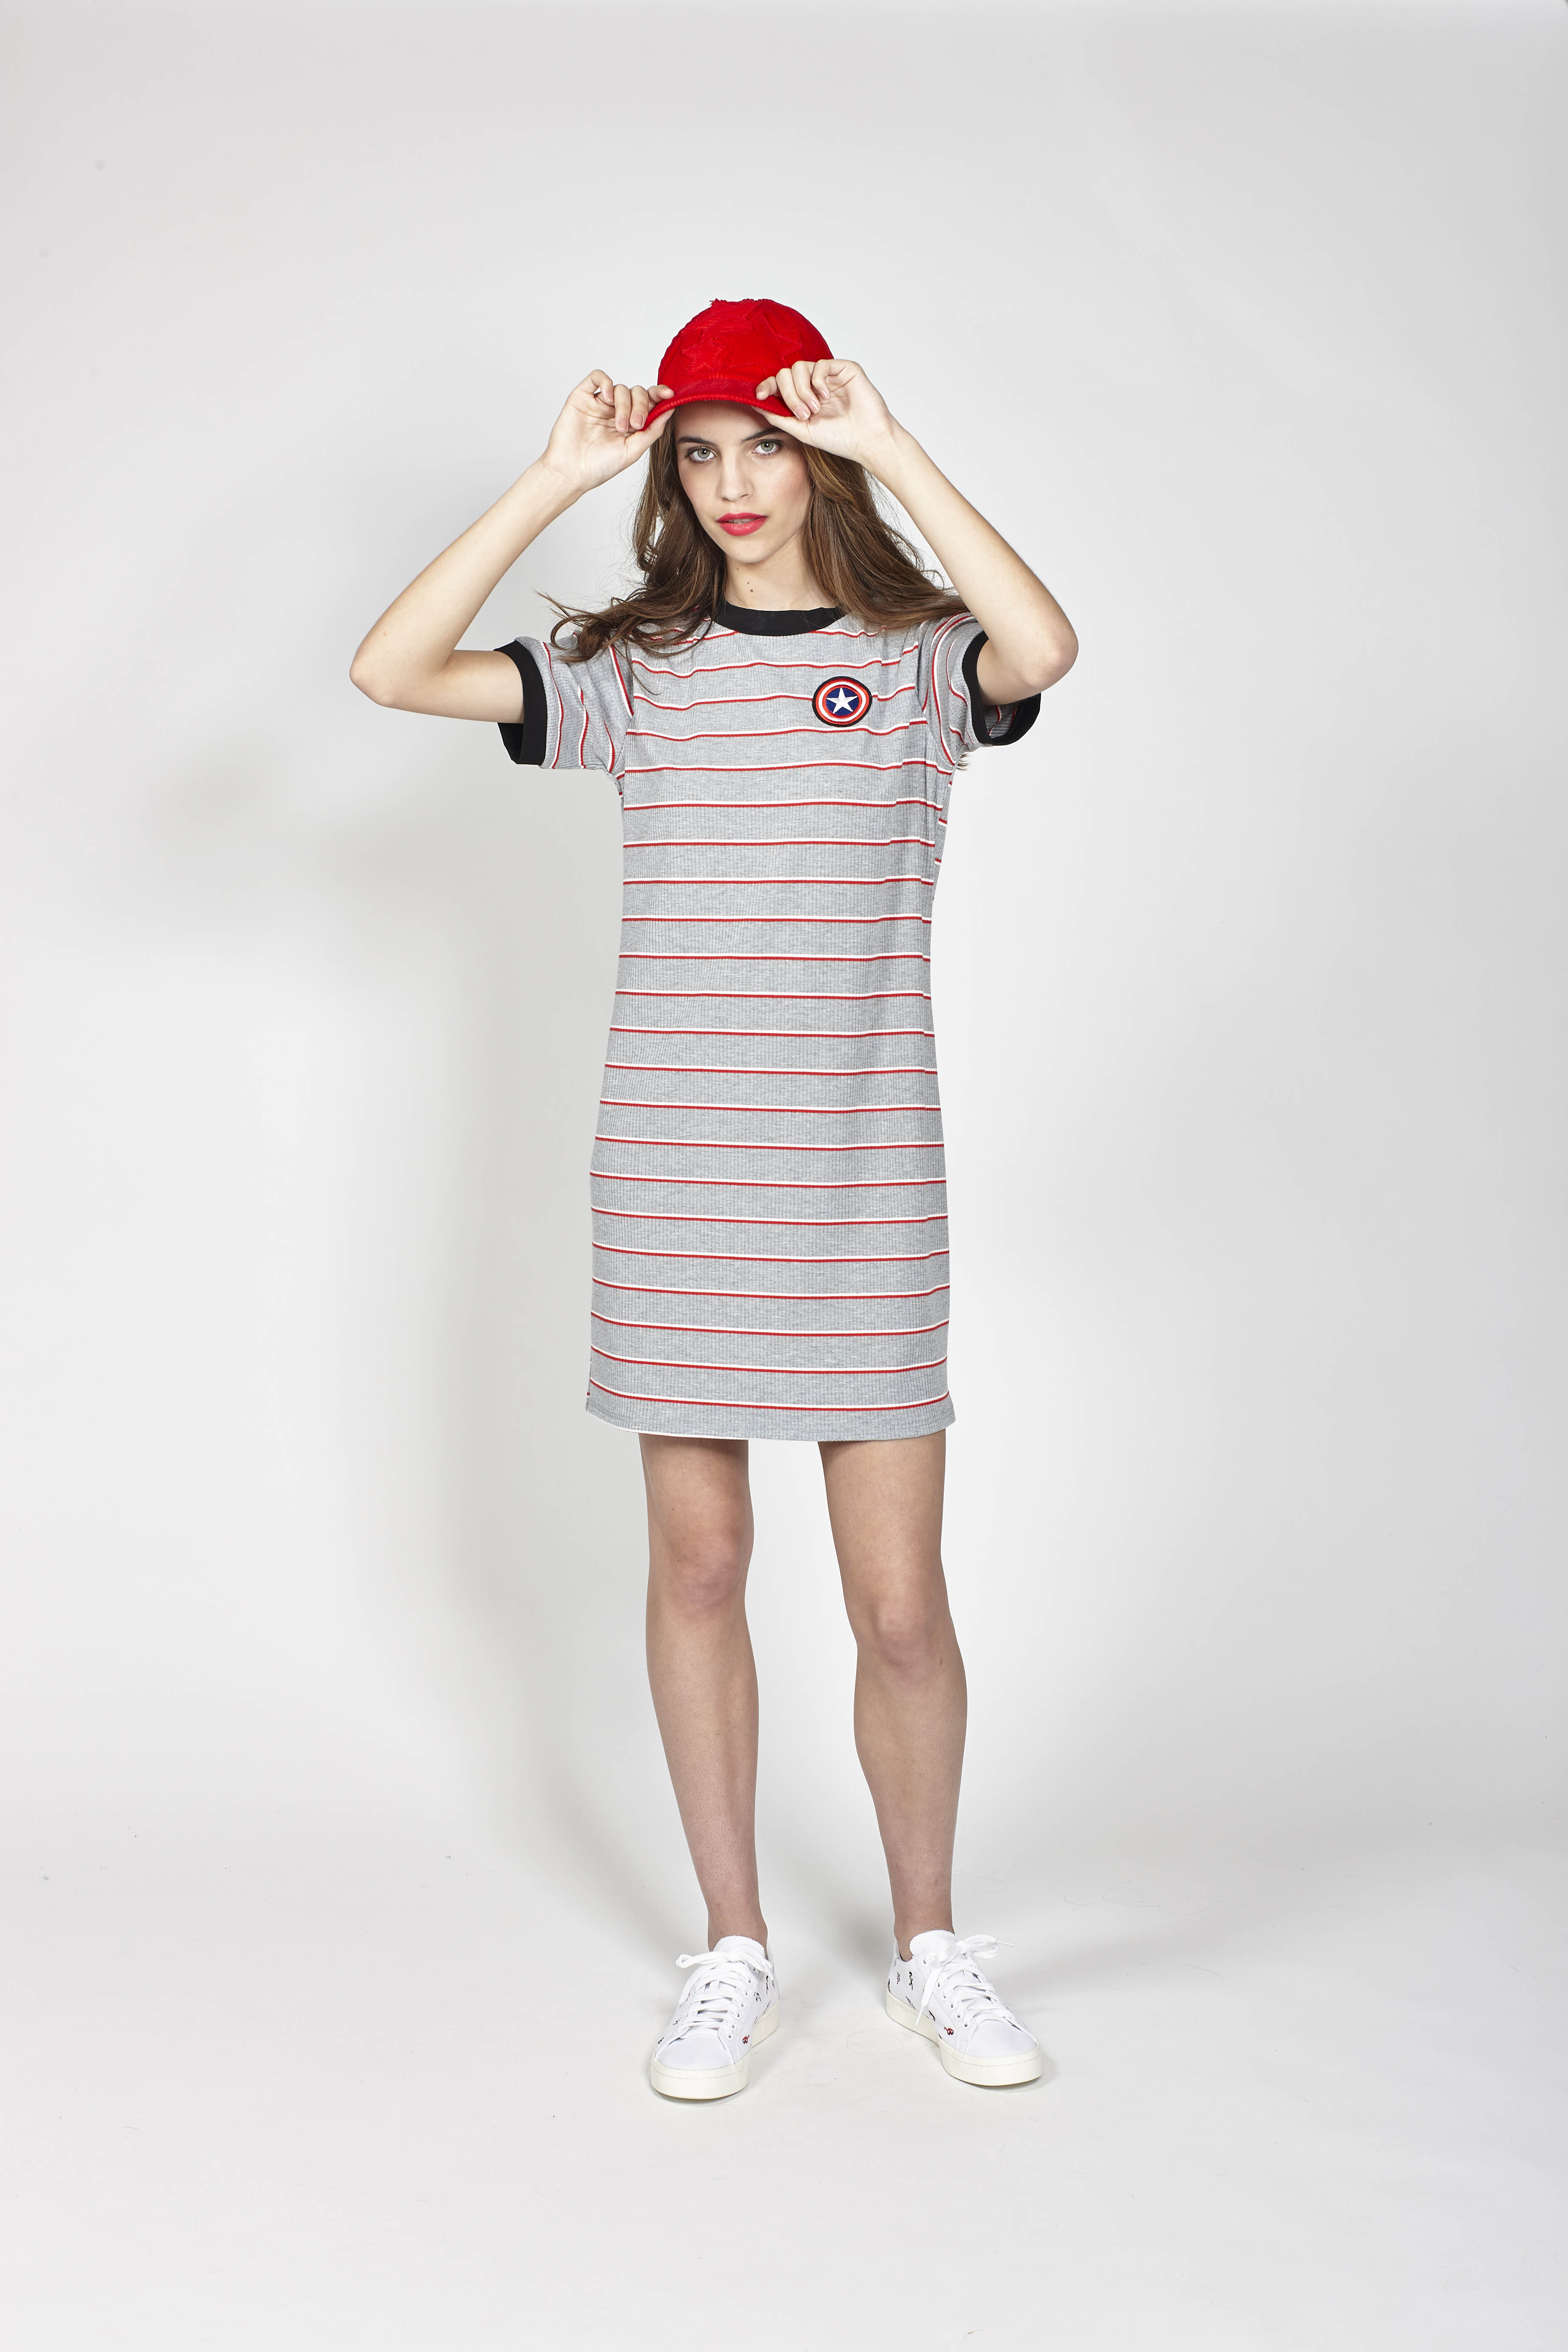 LB1090 LEO+BE Wonder Dress, RRP$139.00